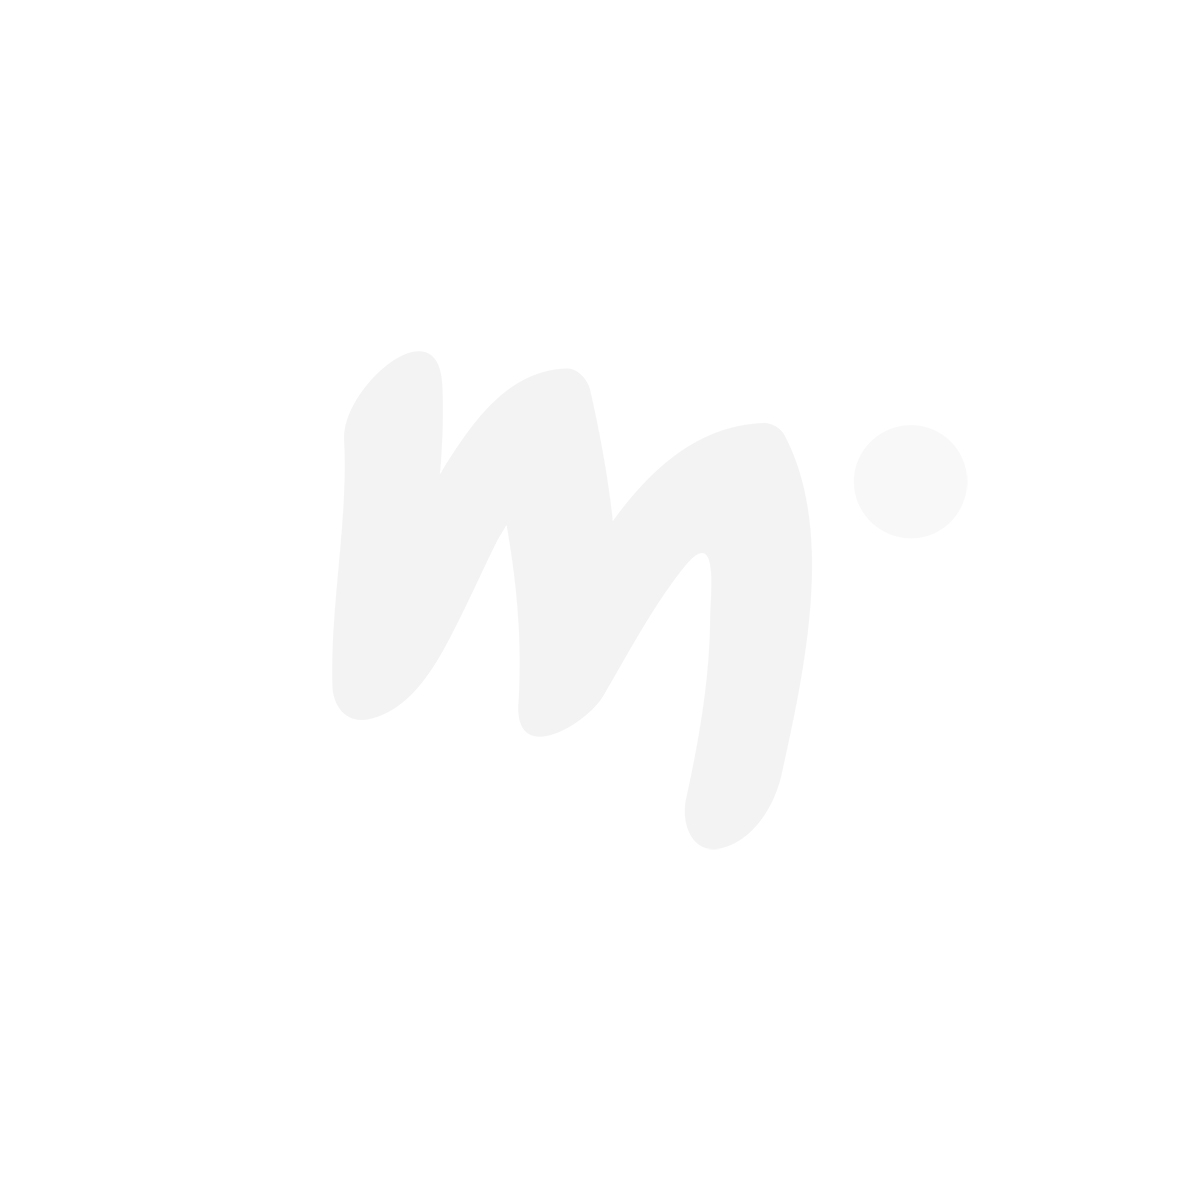 Muumi Syyshetki-housut roosa